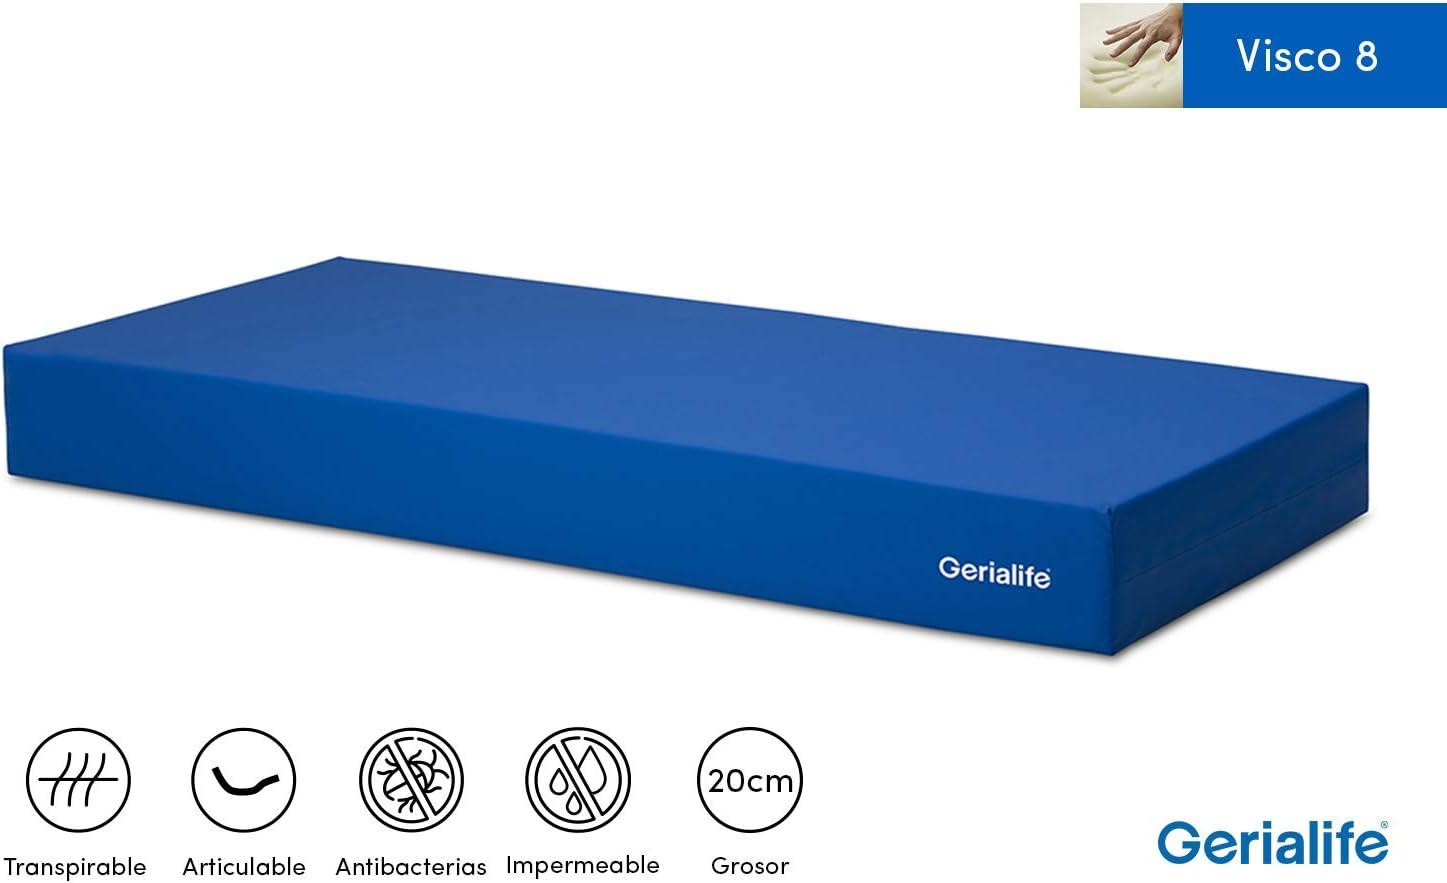 Gerialife® Colchón Geriátrico Hospitalario Articulado | 8 cm de Viscoelástica | Funda Sanitaria Impermeable (90x190)